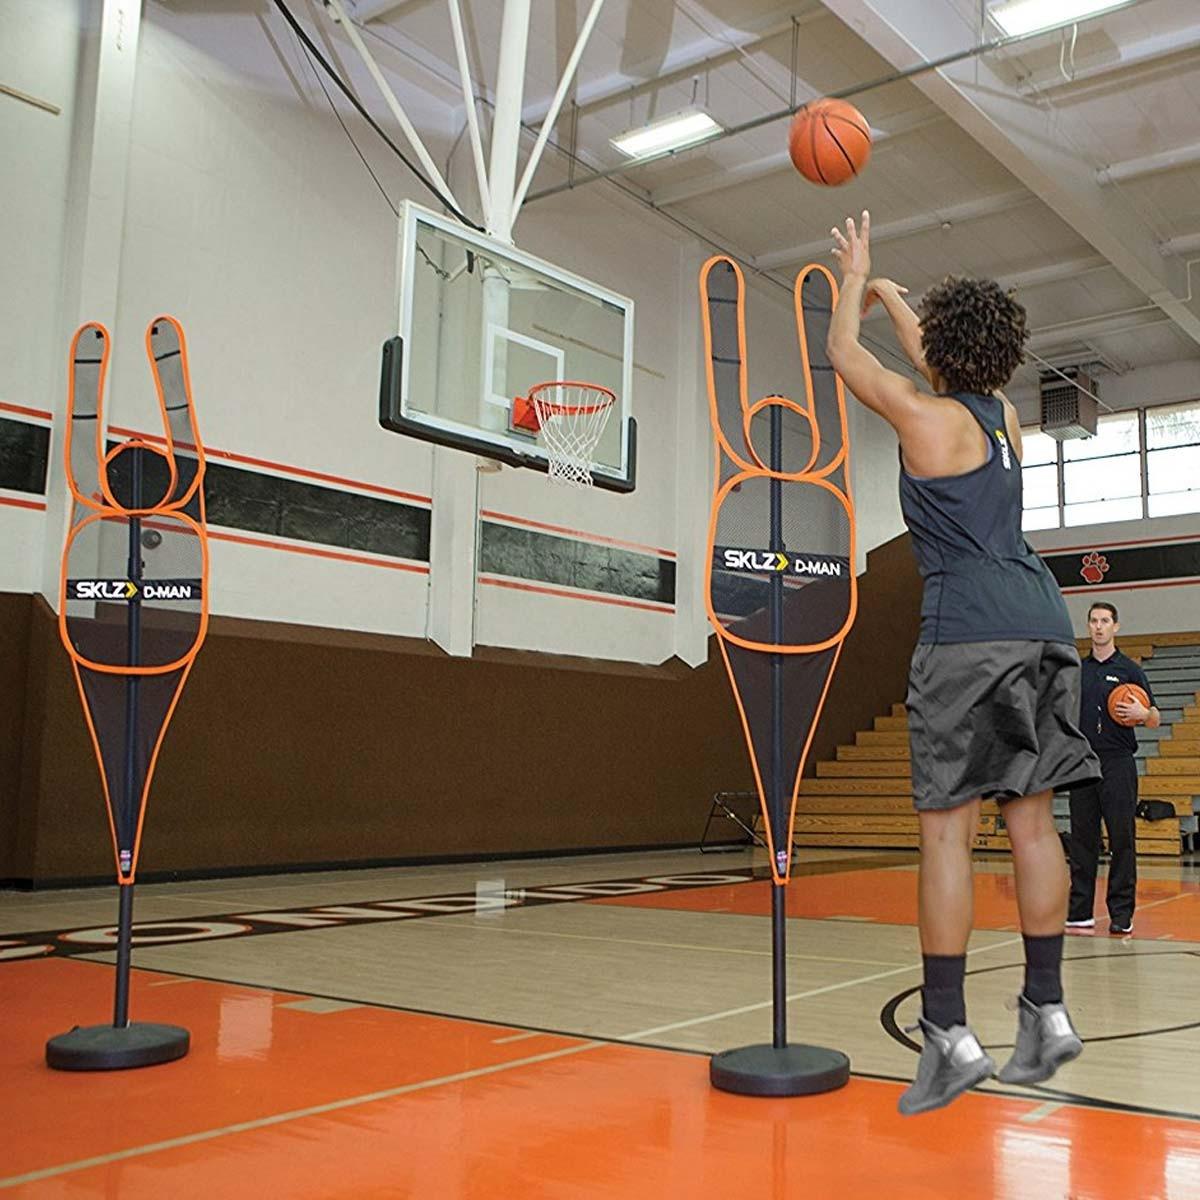 SKLZ DMAN Basketball HandsUp Training Mannequin  A85